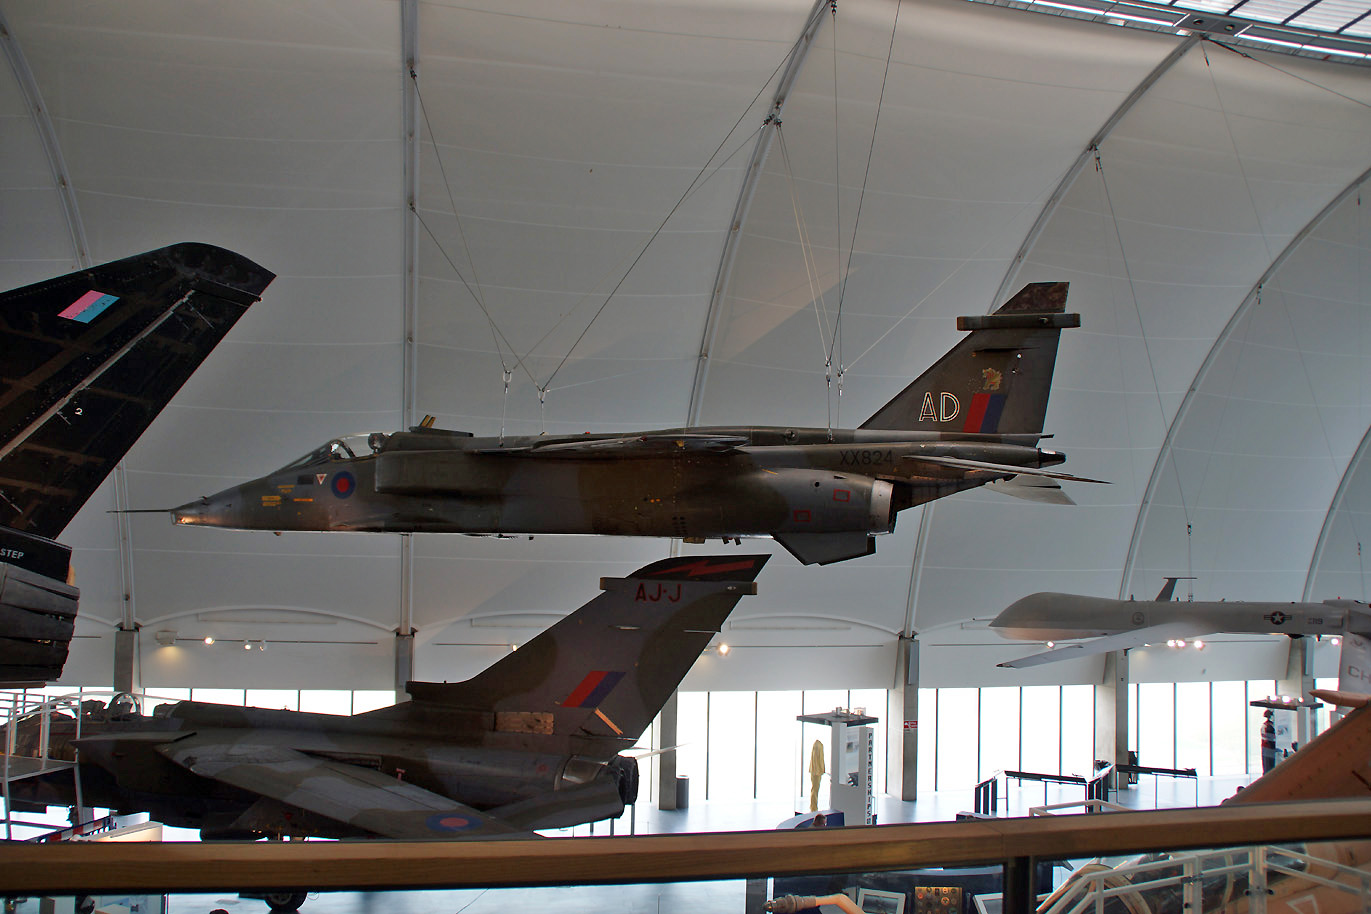 SEPECAT Jaguar GR 3A - Aviationmuseum